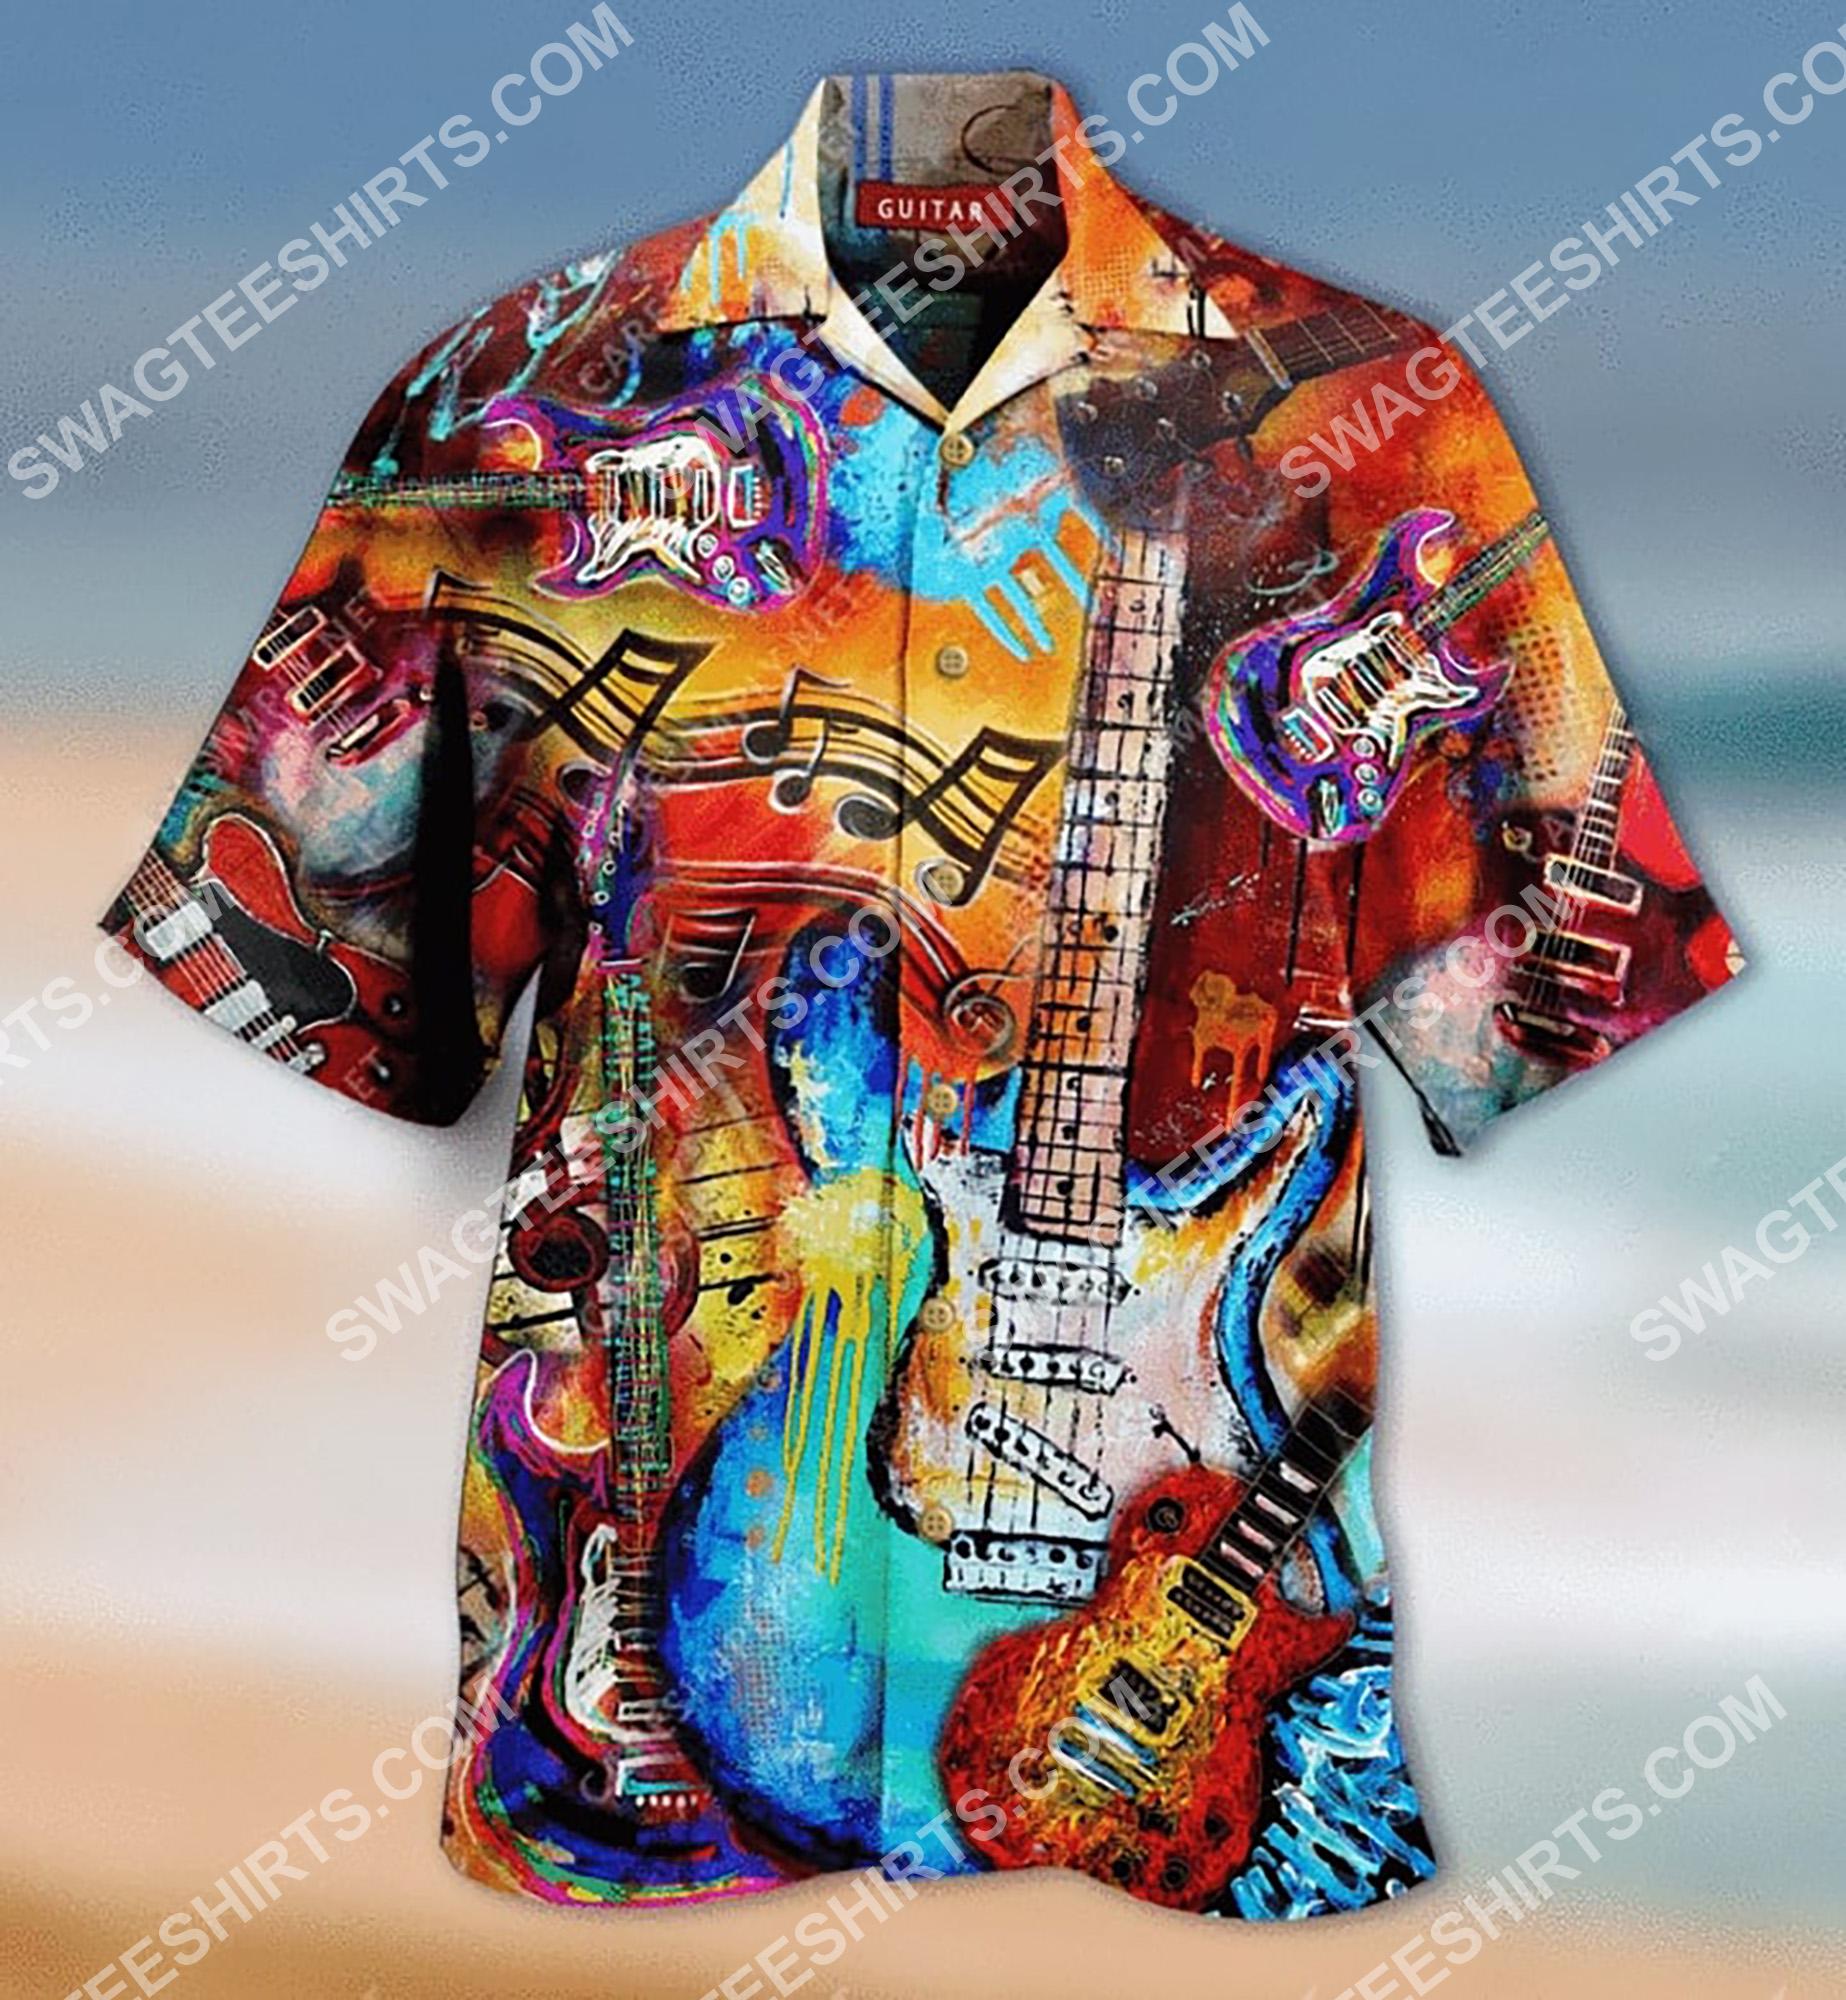 vintage guitar colorful all over printing hawaiian shirt 2(1)